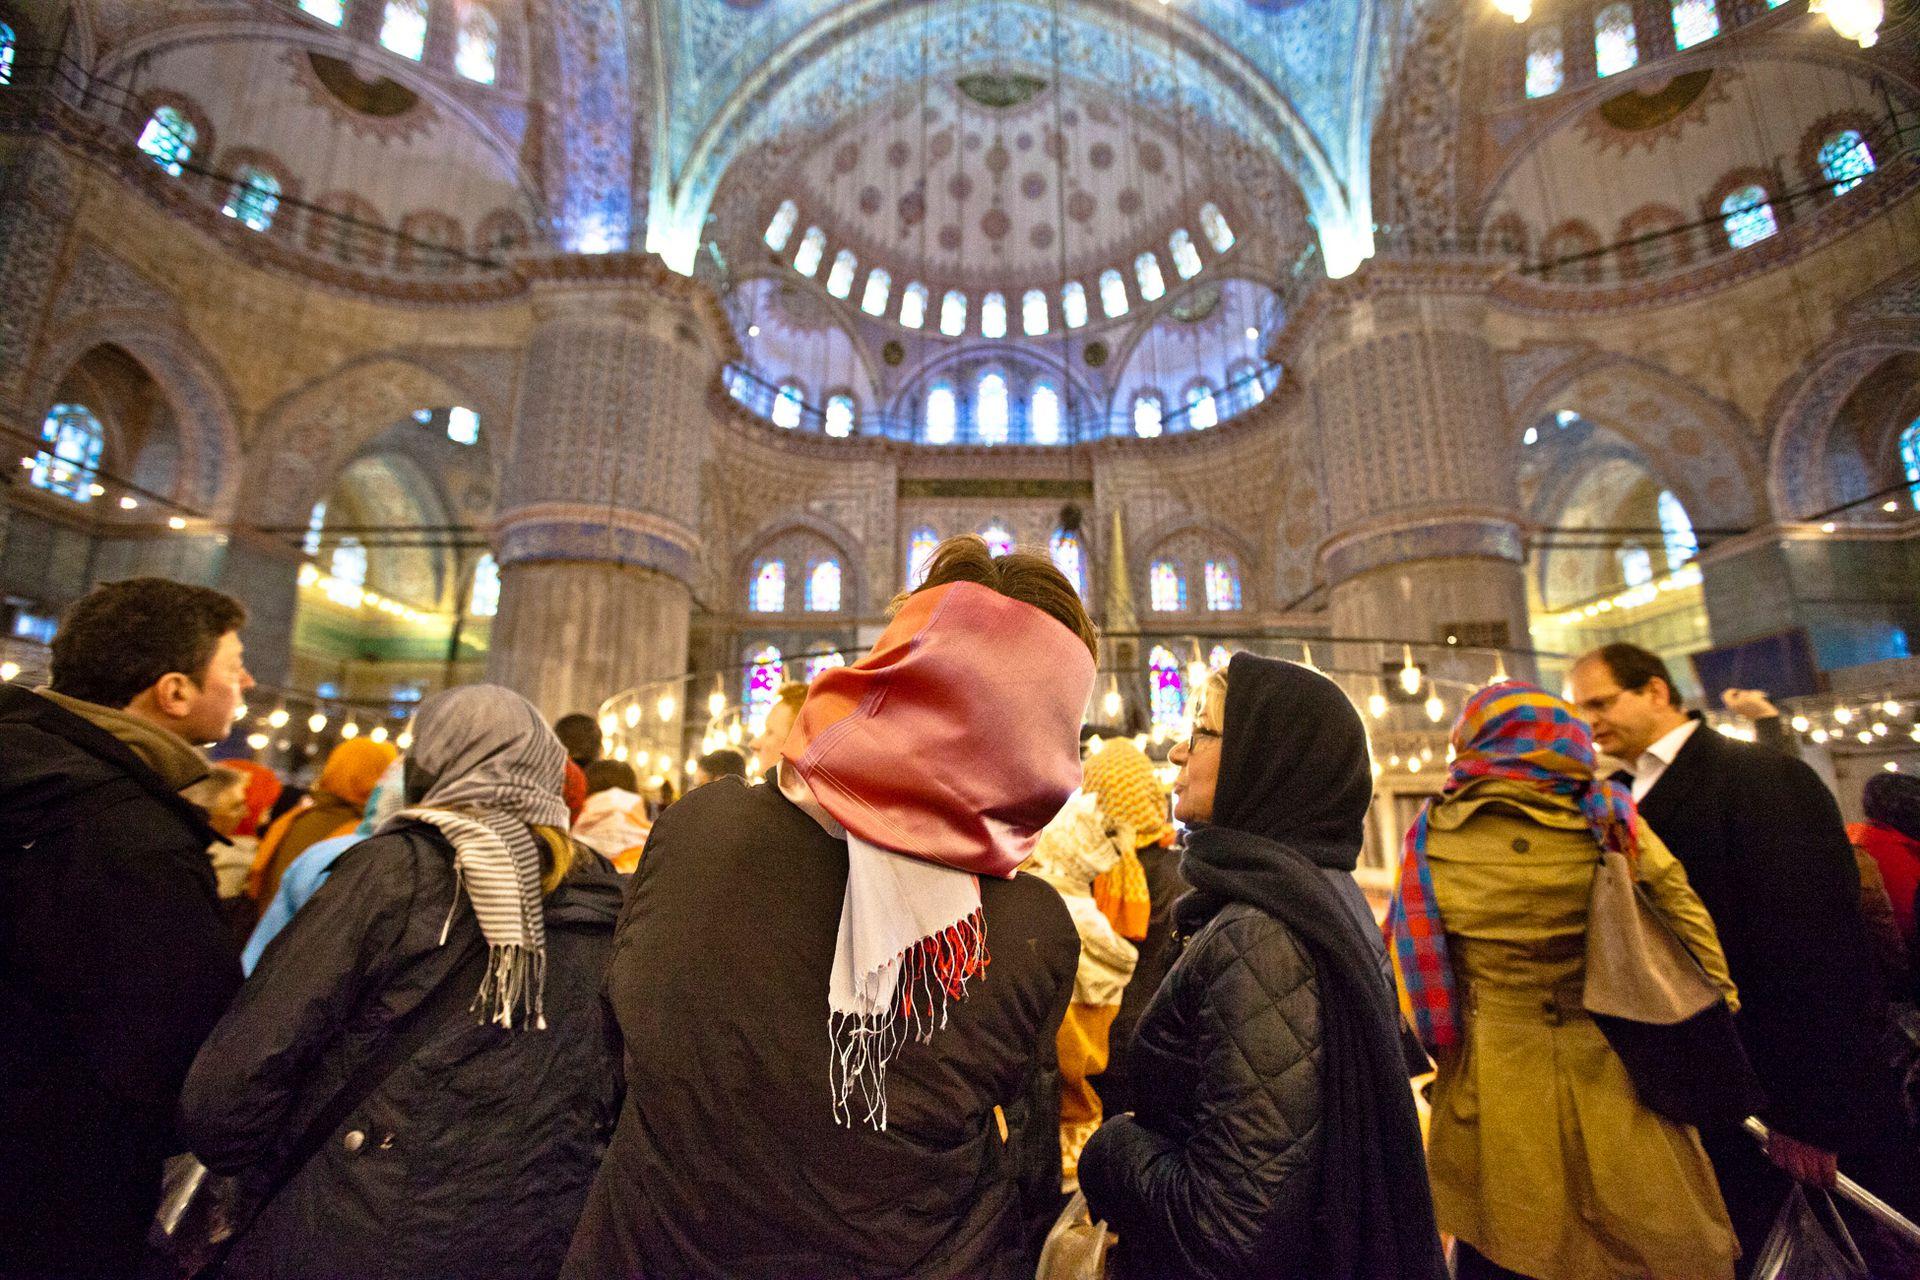 La Mezquita Suleiman en Estambul.